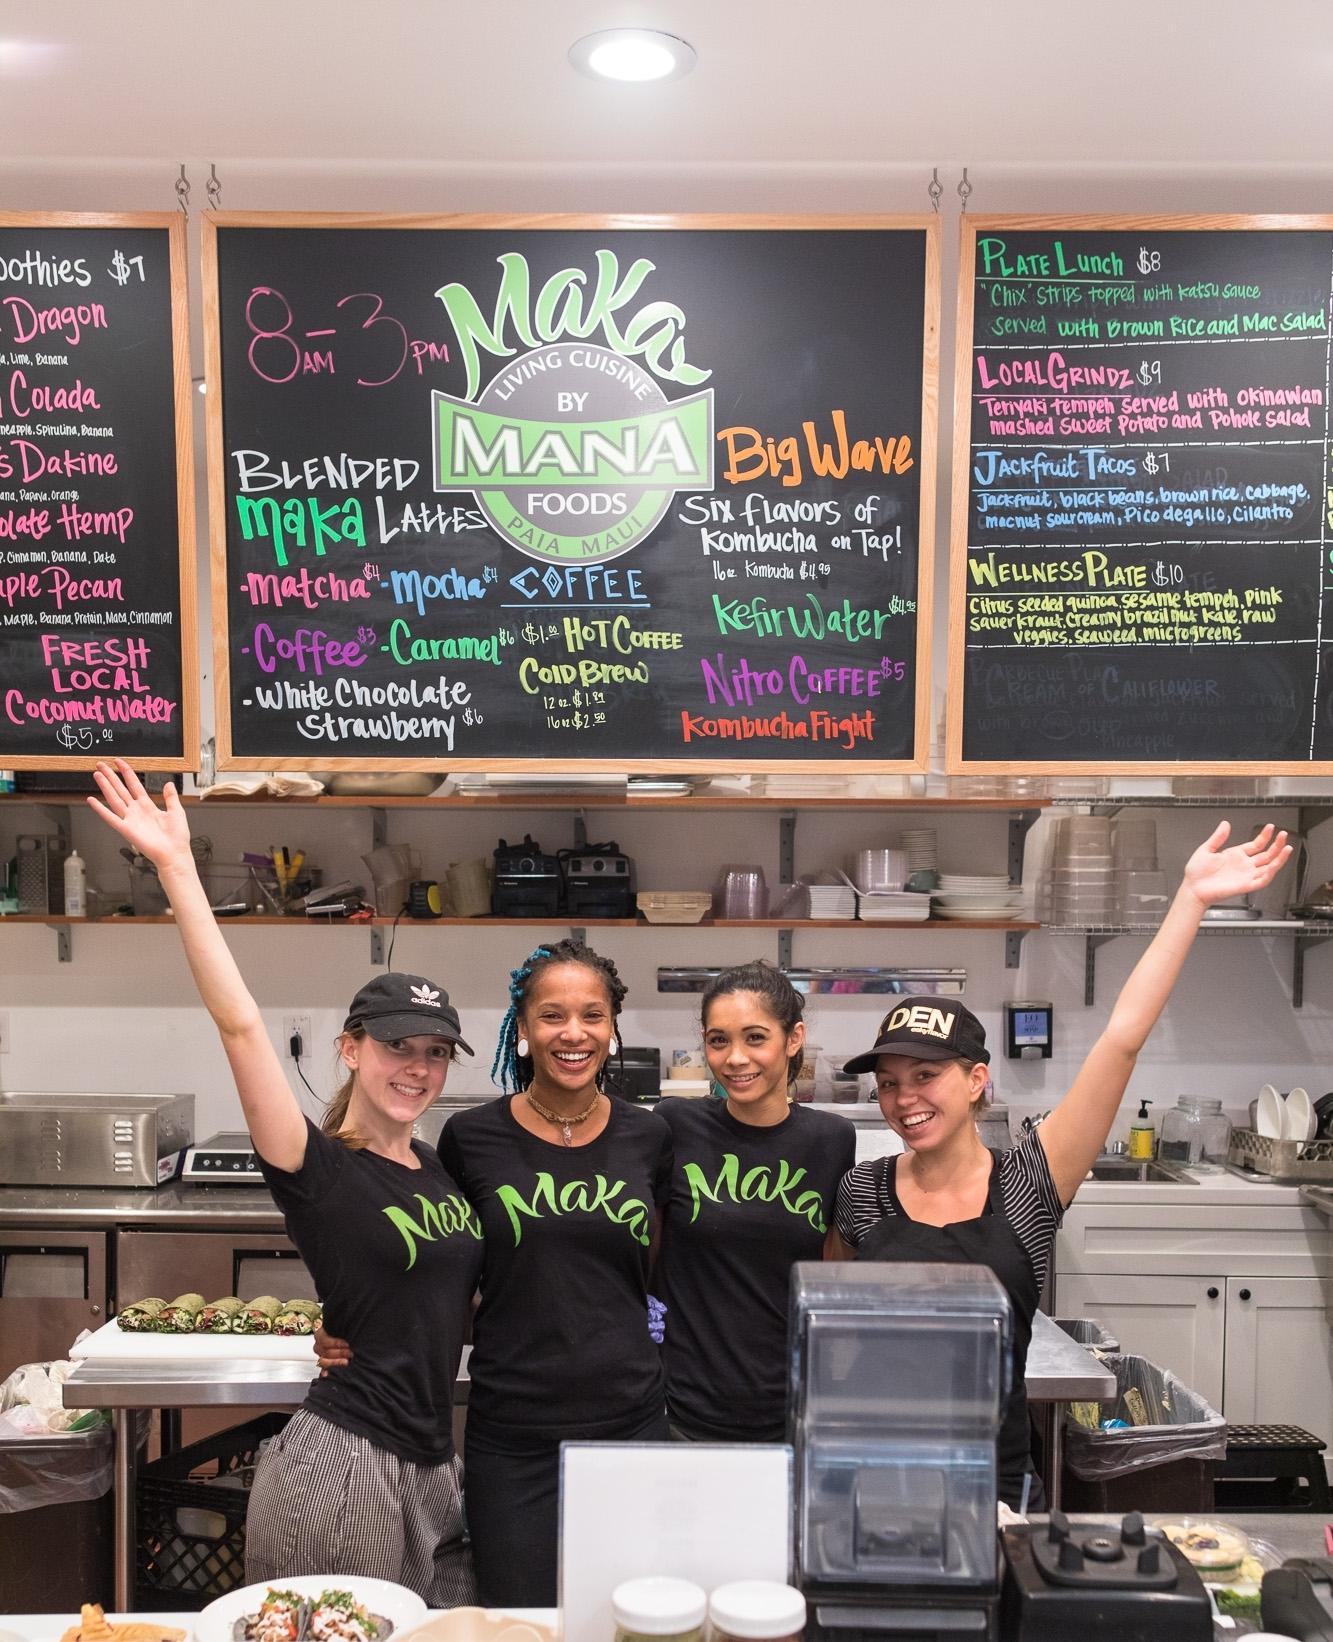 maka-vegan-gluten-free-cafe-maui-7.jpg